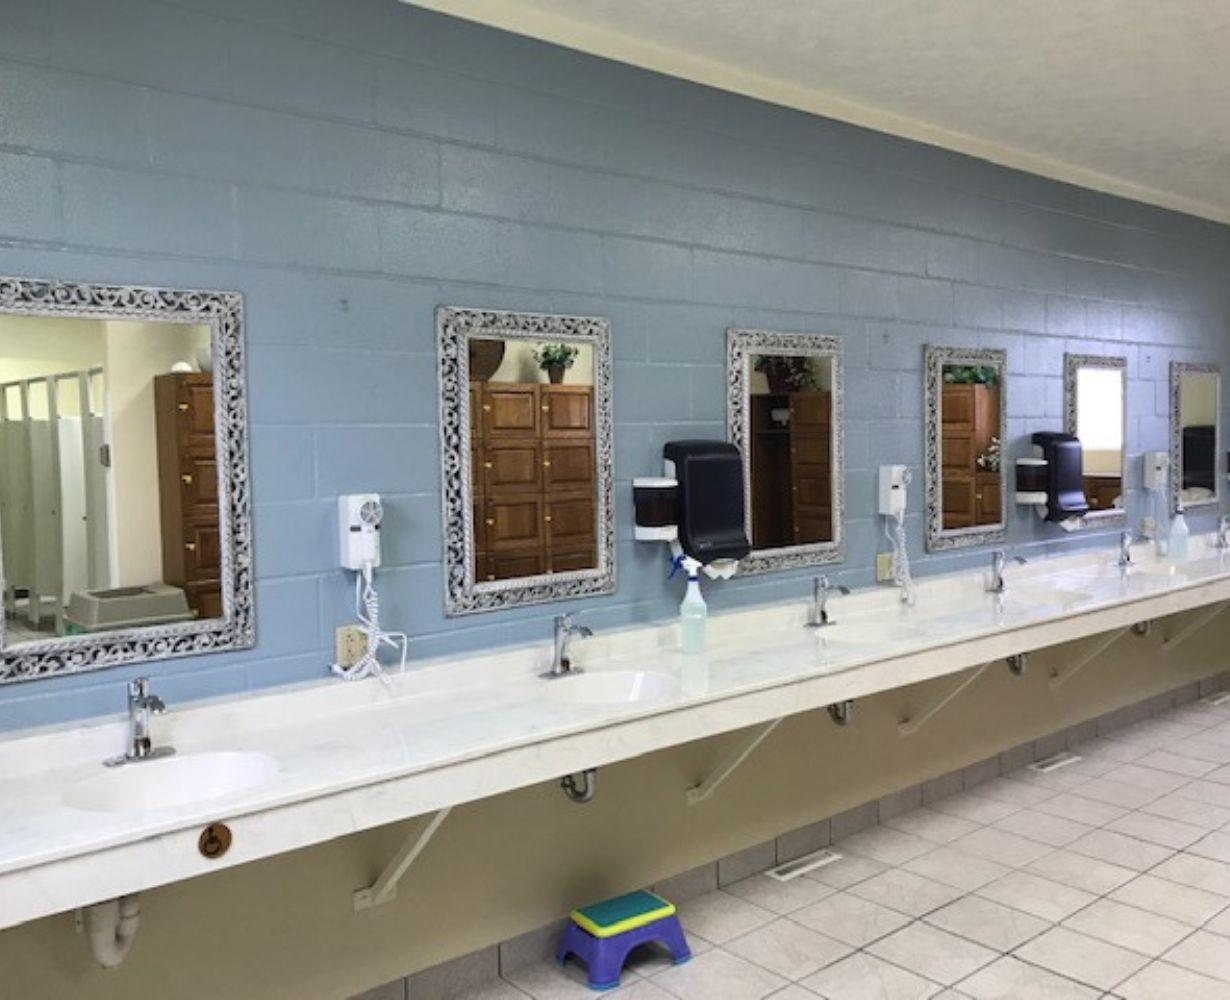 son-rise-marina-sandusky-ohio-gallery-bathrooms